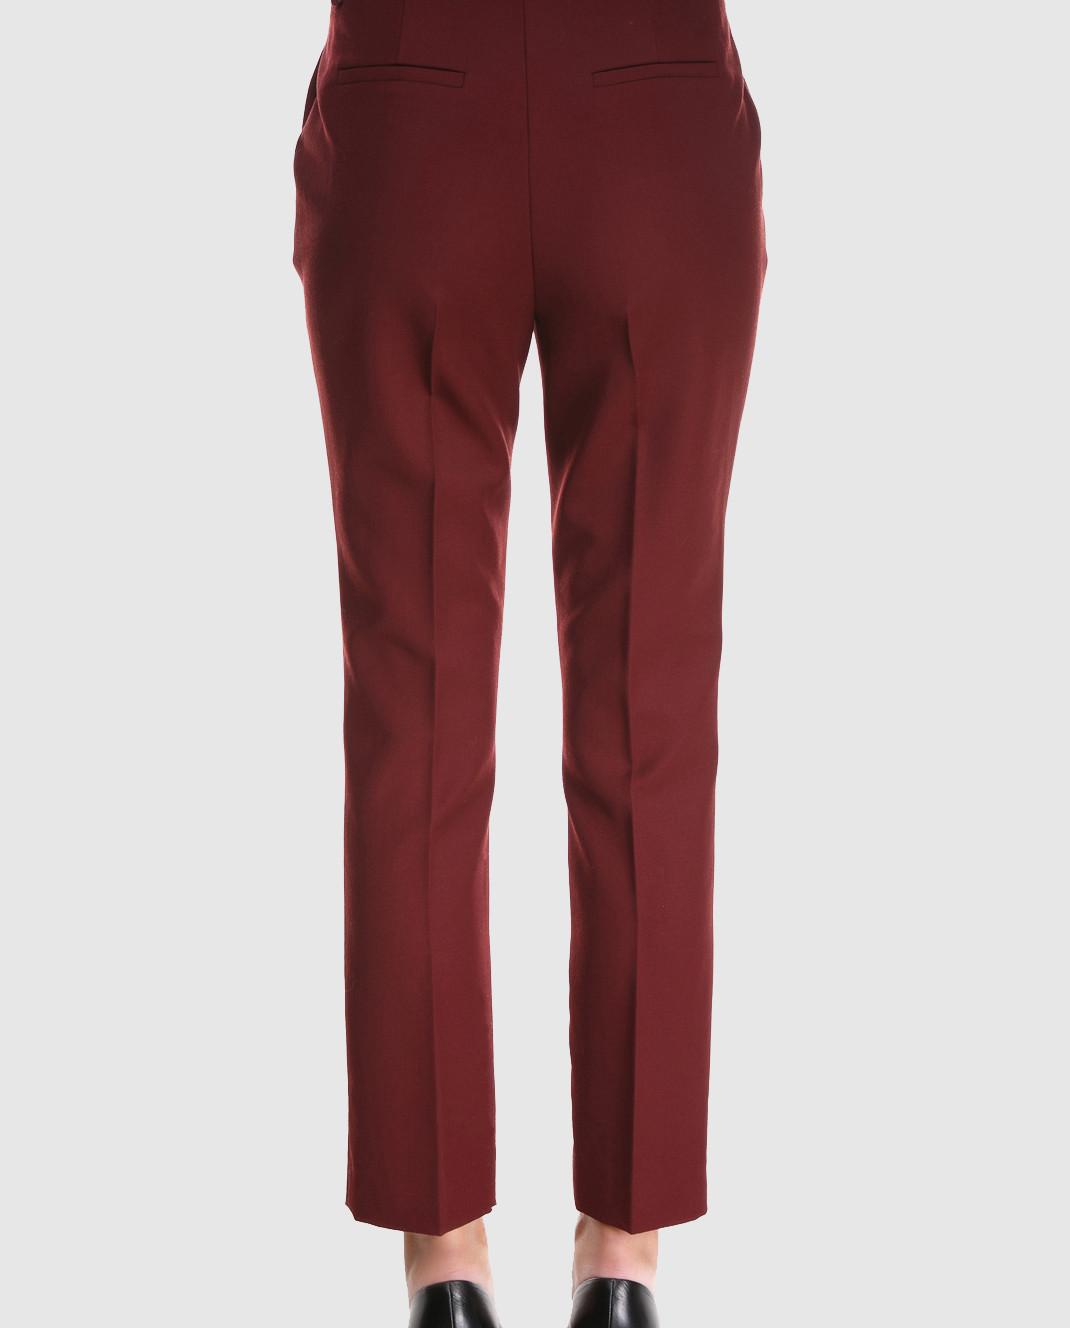 Victoria by Victoria Beckham Бордовые брюки из шерсти TRVV085B изображение 5